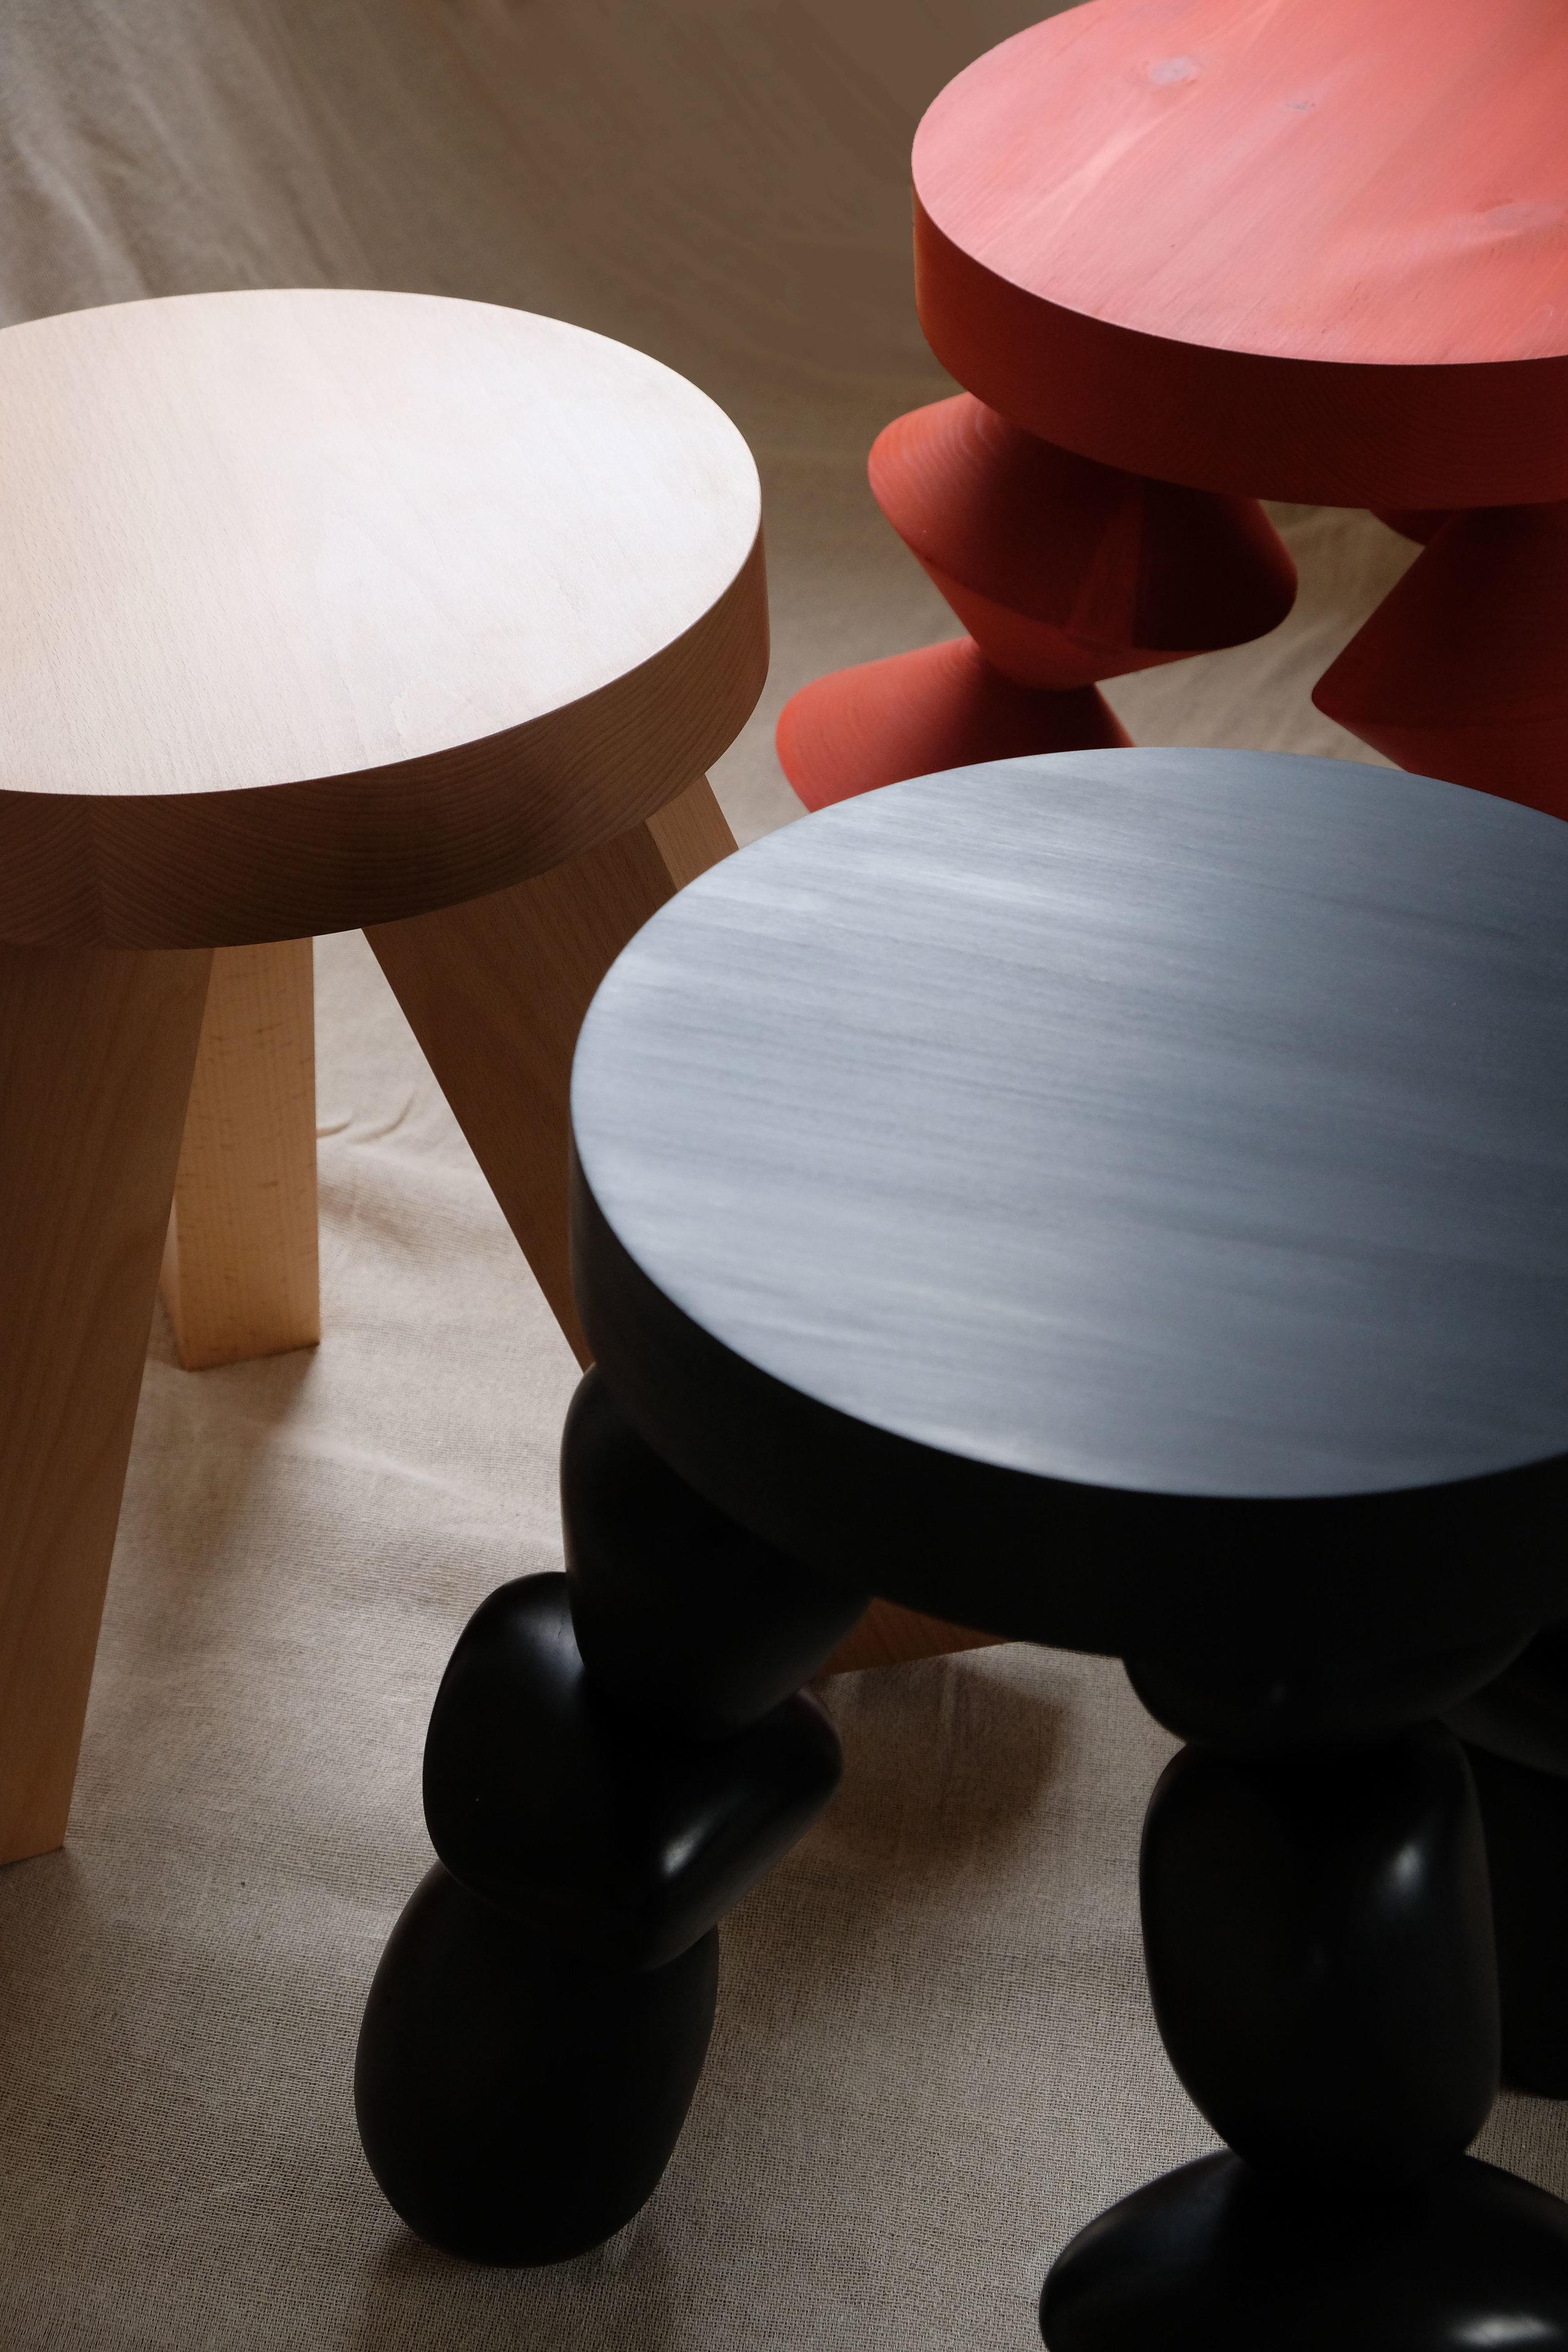 Primitive Forms  |  White Stool, Black Stool, Red Stool  | White Beech, Birch, Redwood | © Phat Design